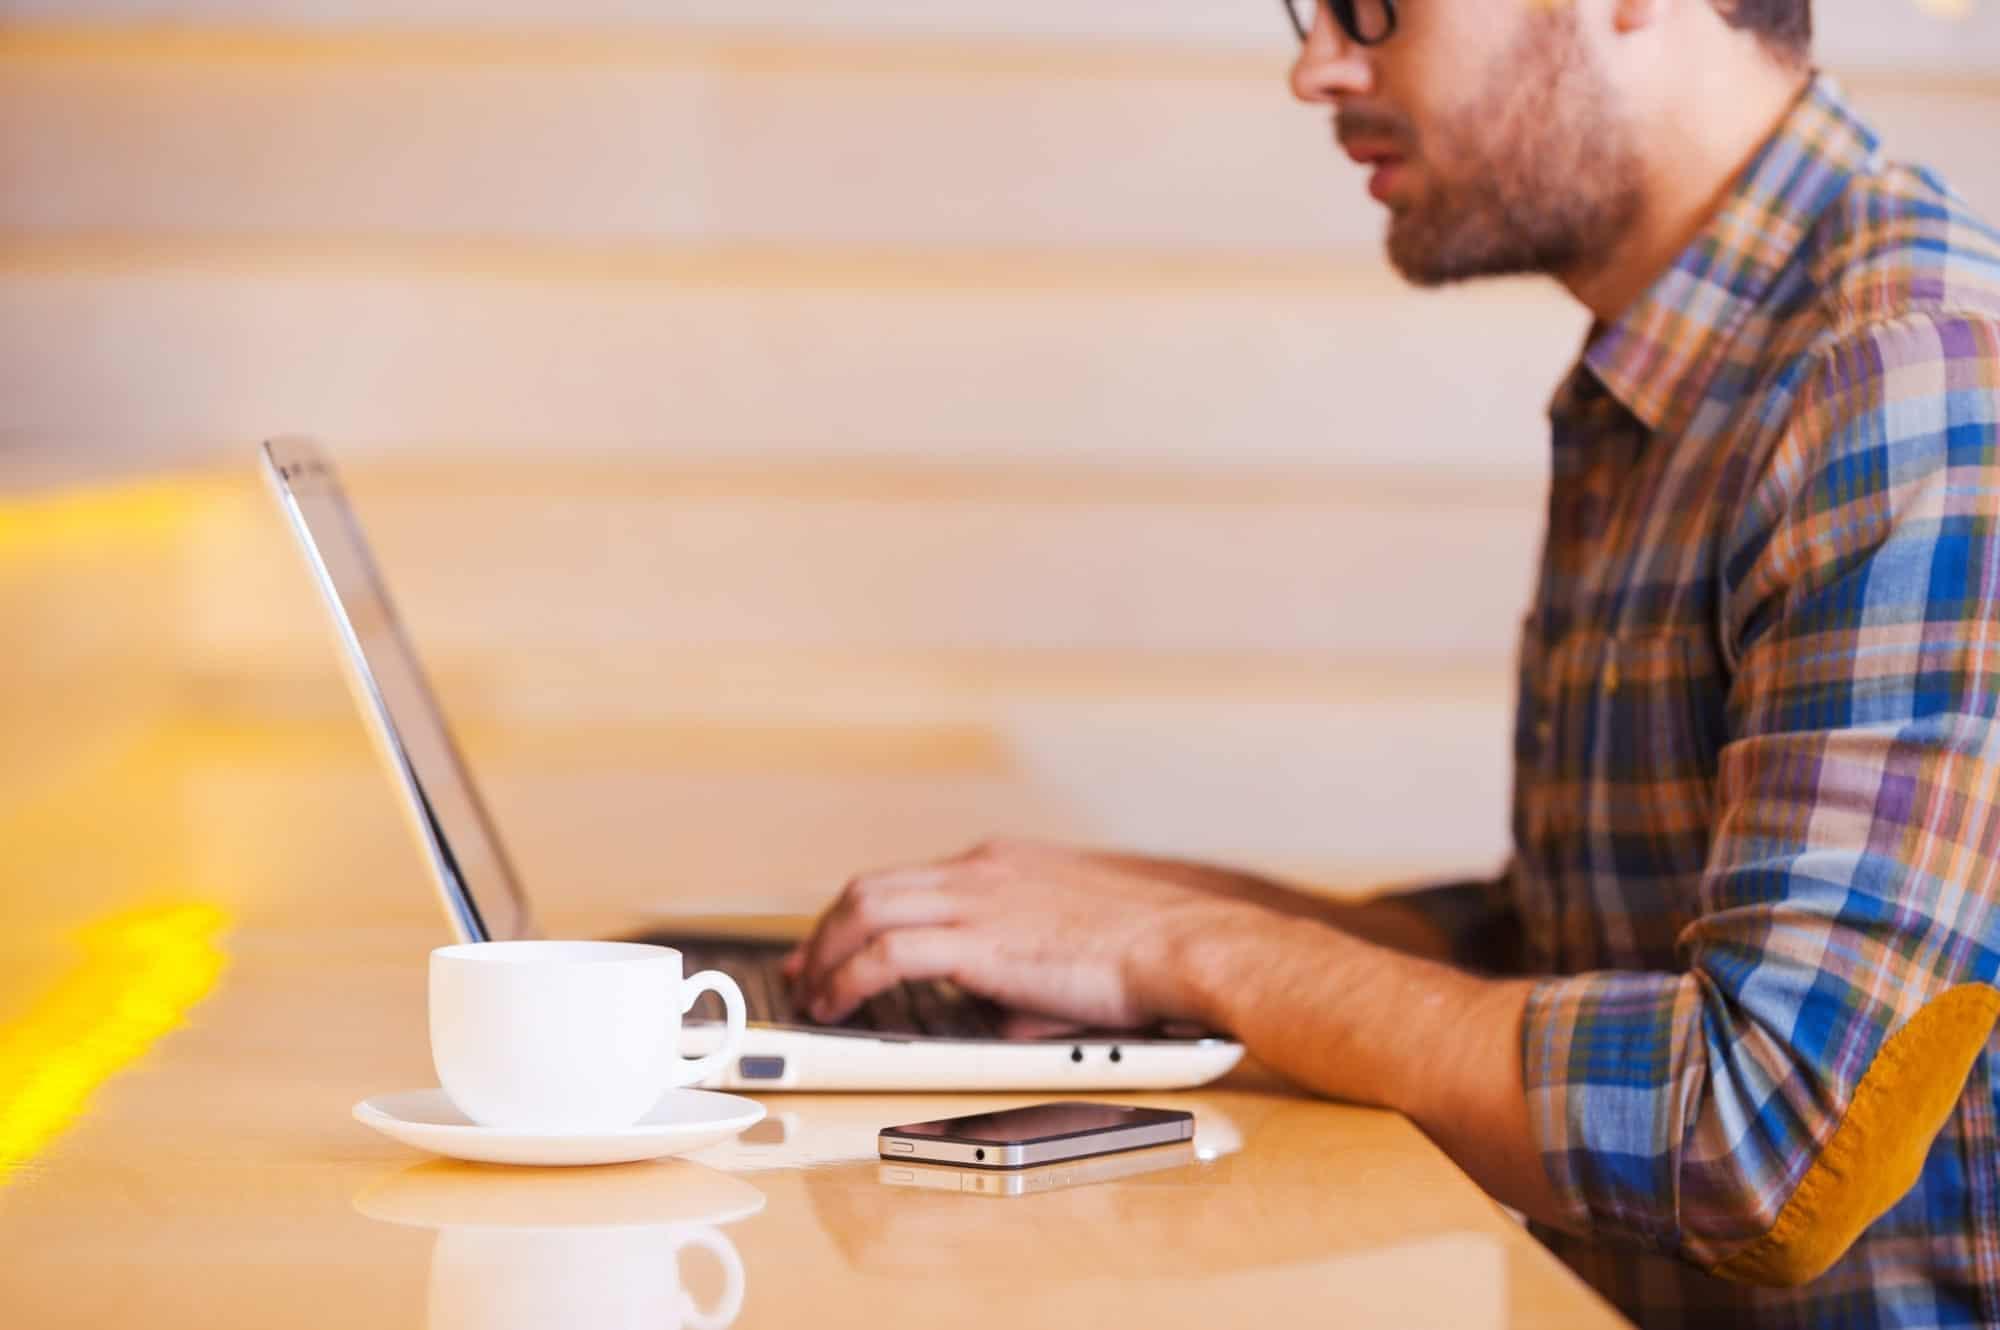 matrimoniale, sentimente, dating online